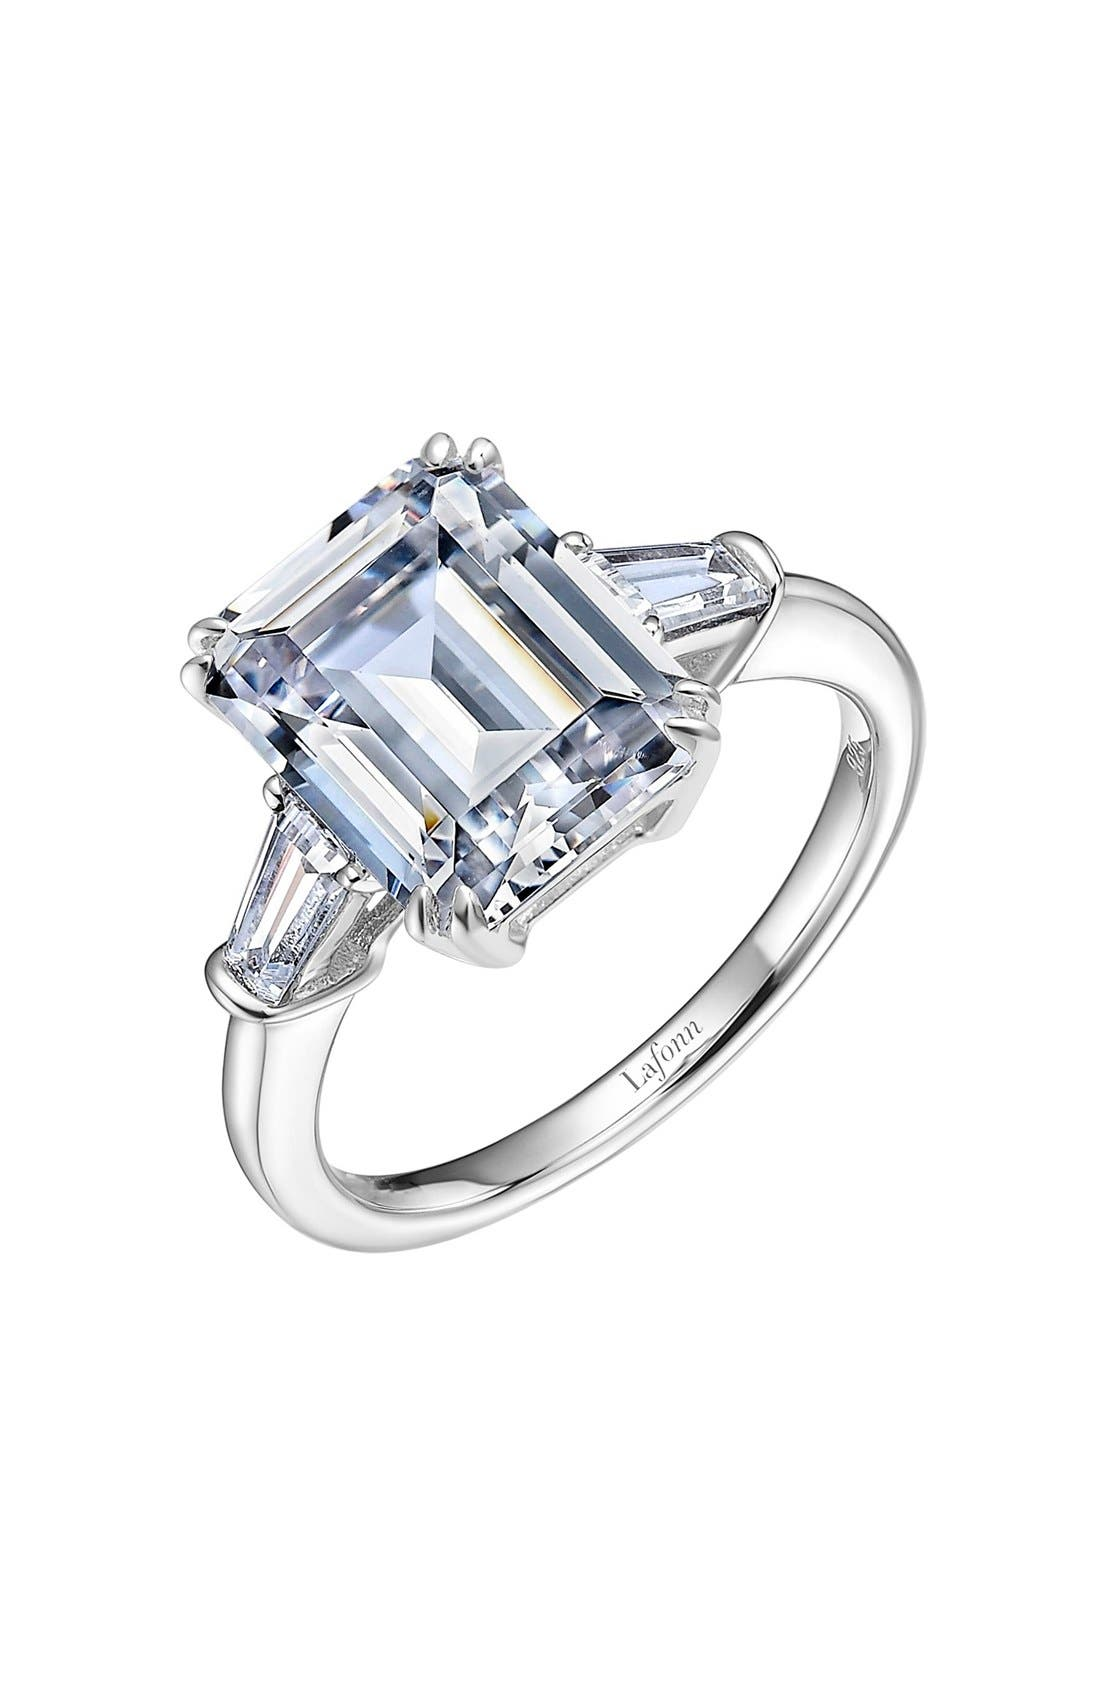 Main Image - Lafonn 'Lassaire' Three Stone Ring